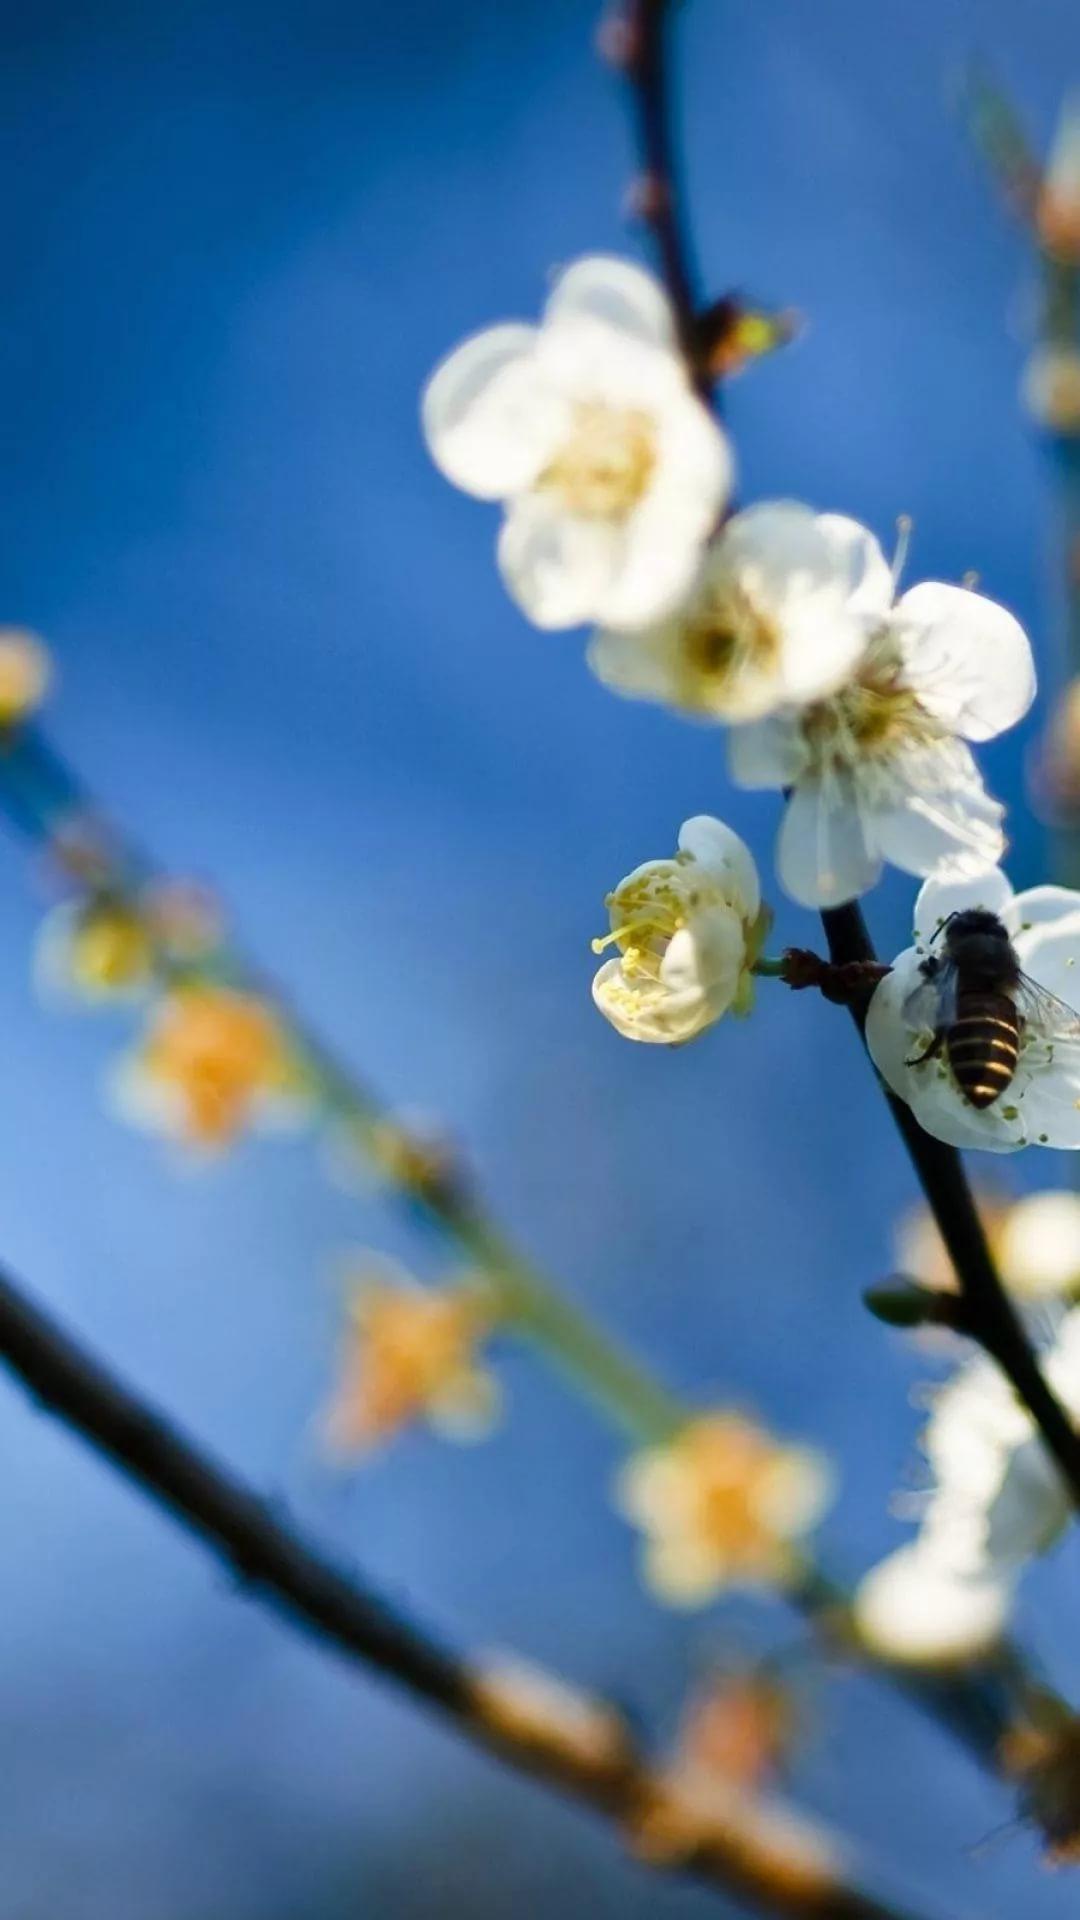 Красивые hd обои весна на телефон 17